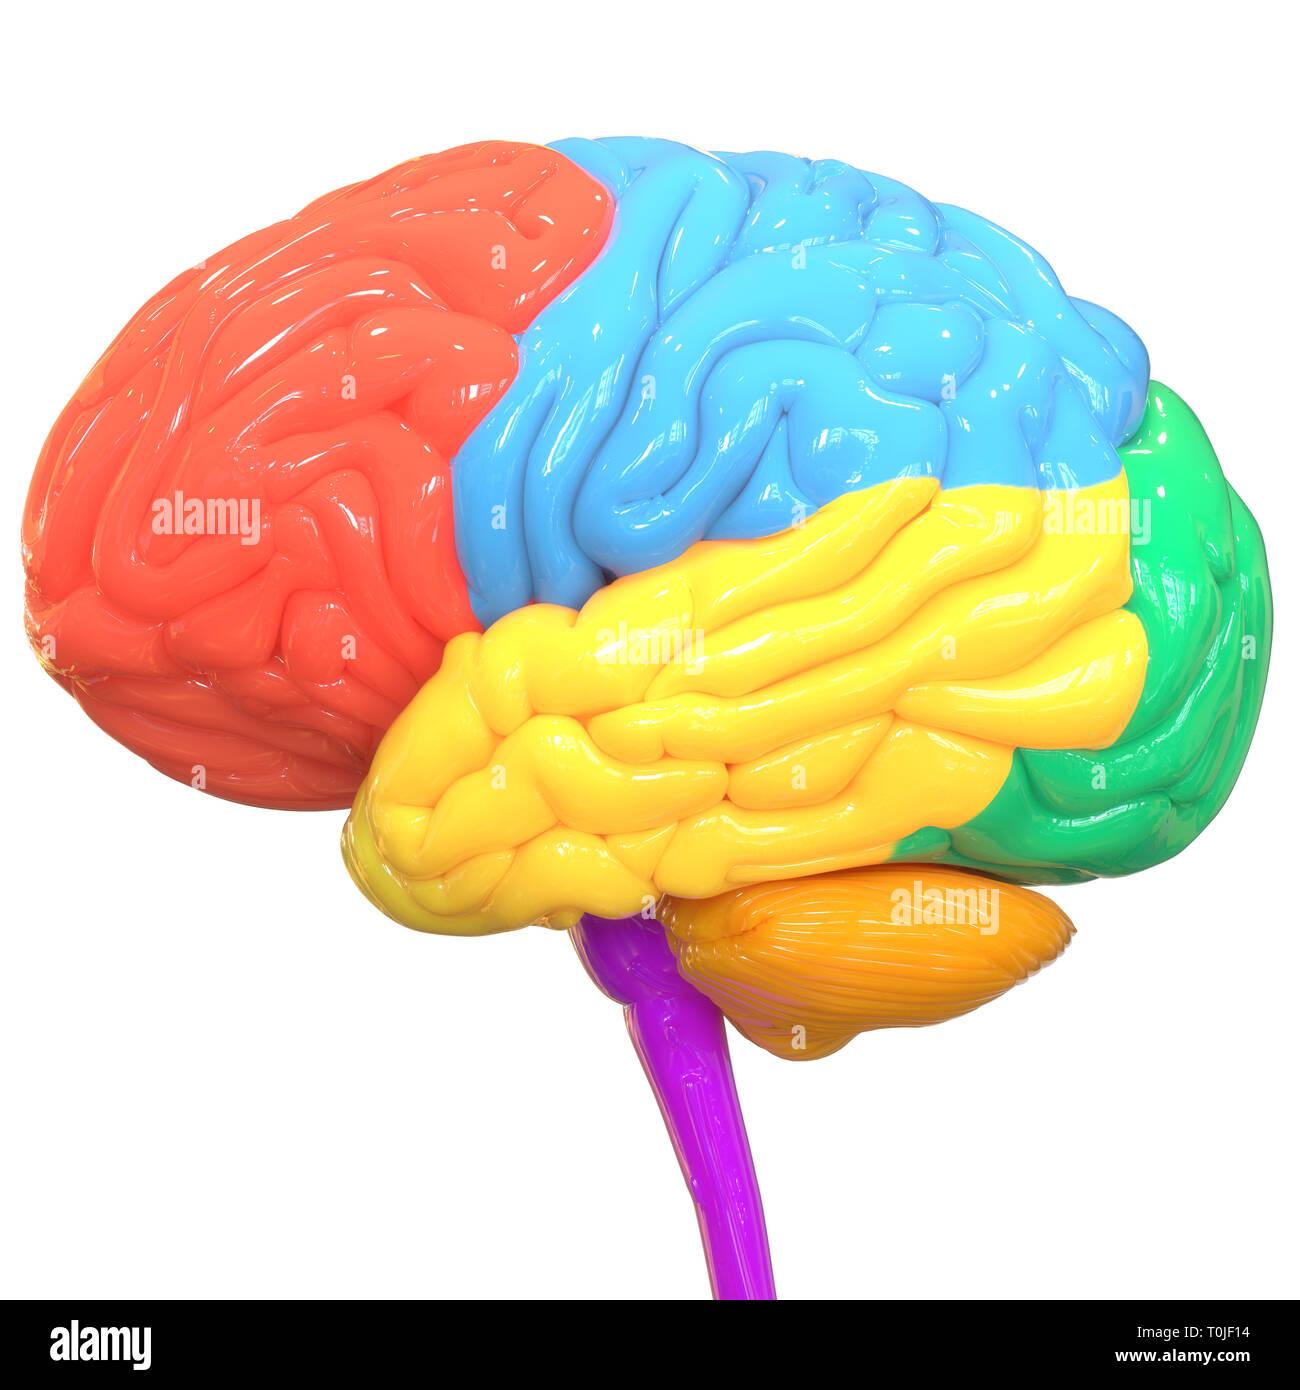 Human Brain Anatomy - Stock Image